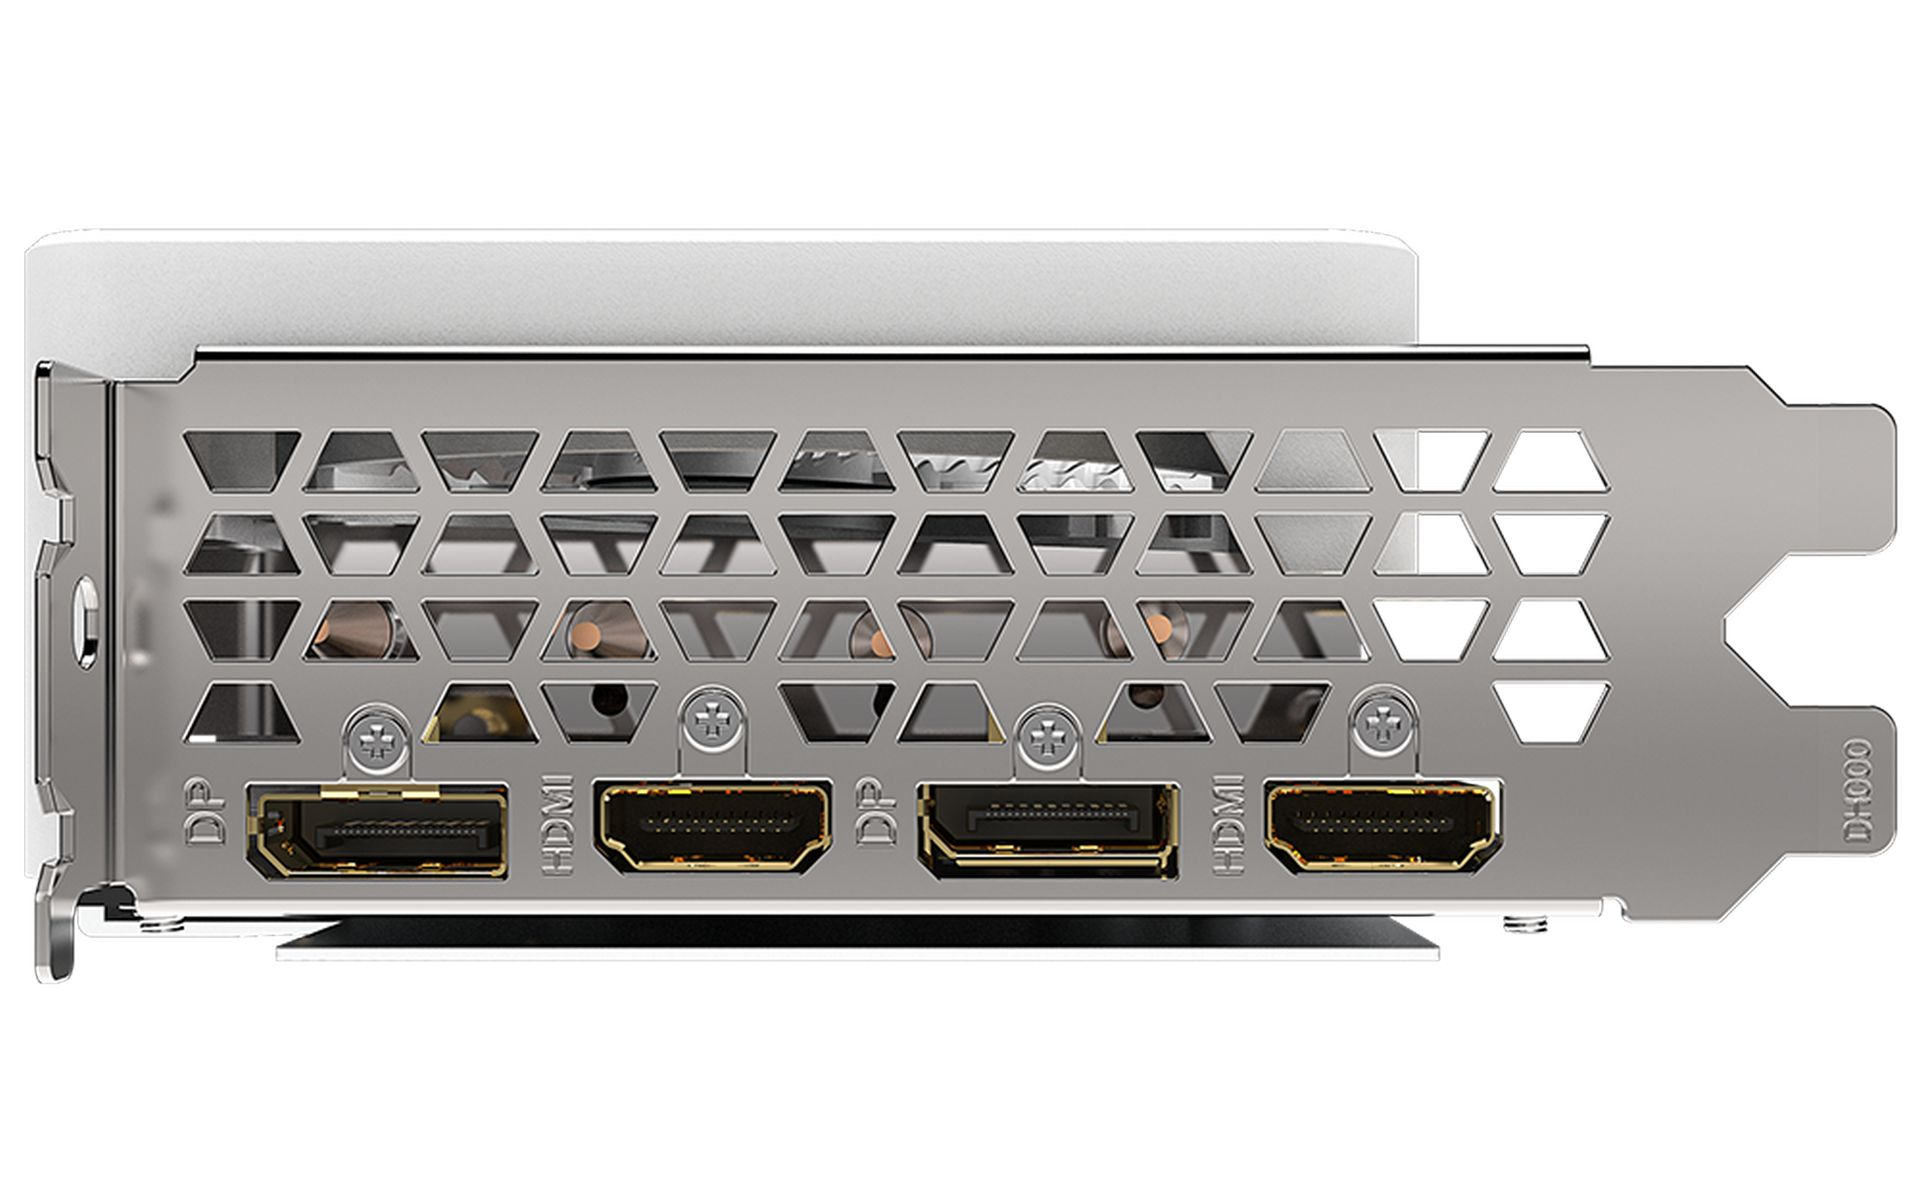 GeForce RTX 3070 VISION OC 8G io